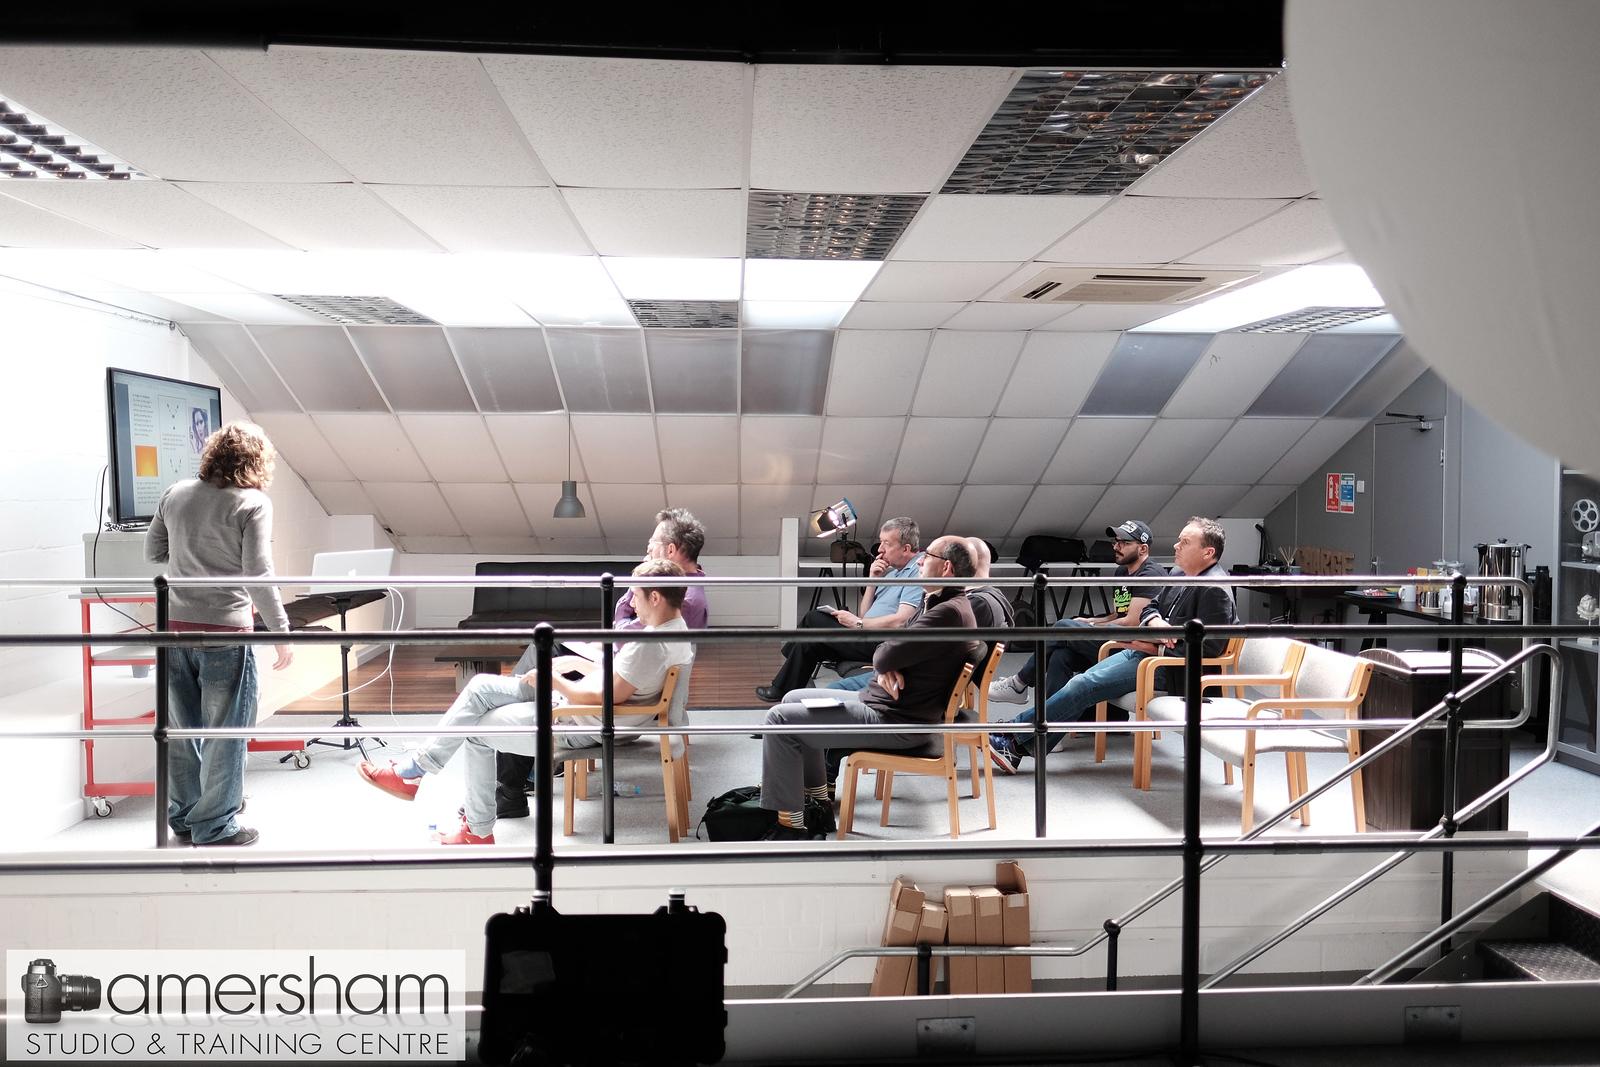 Jake Hicks Workshop exclusivly at Amersham Studios